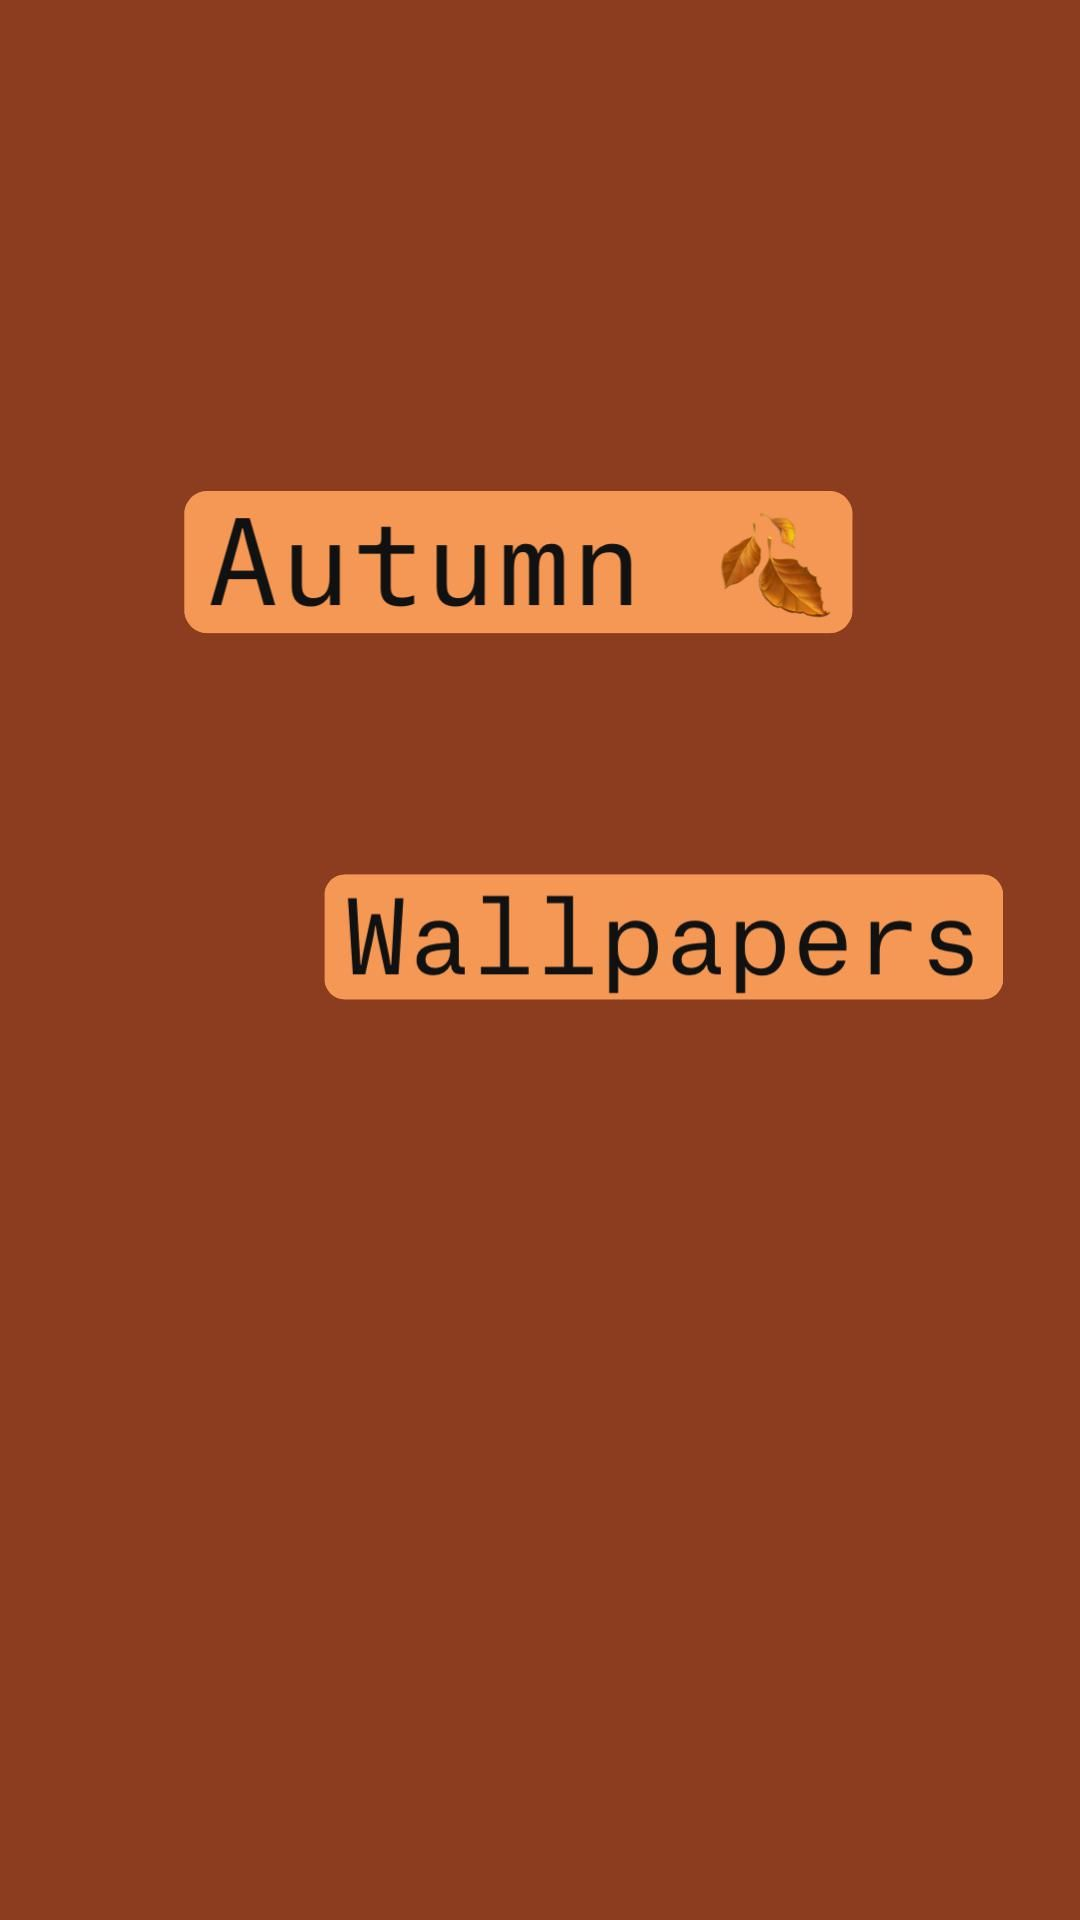 Autumn 🍂 Wallpapers